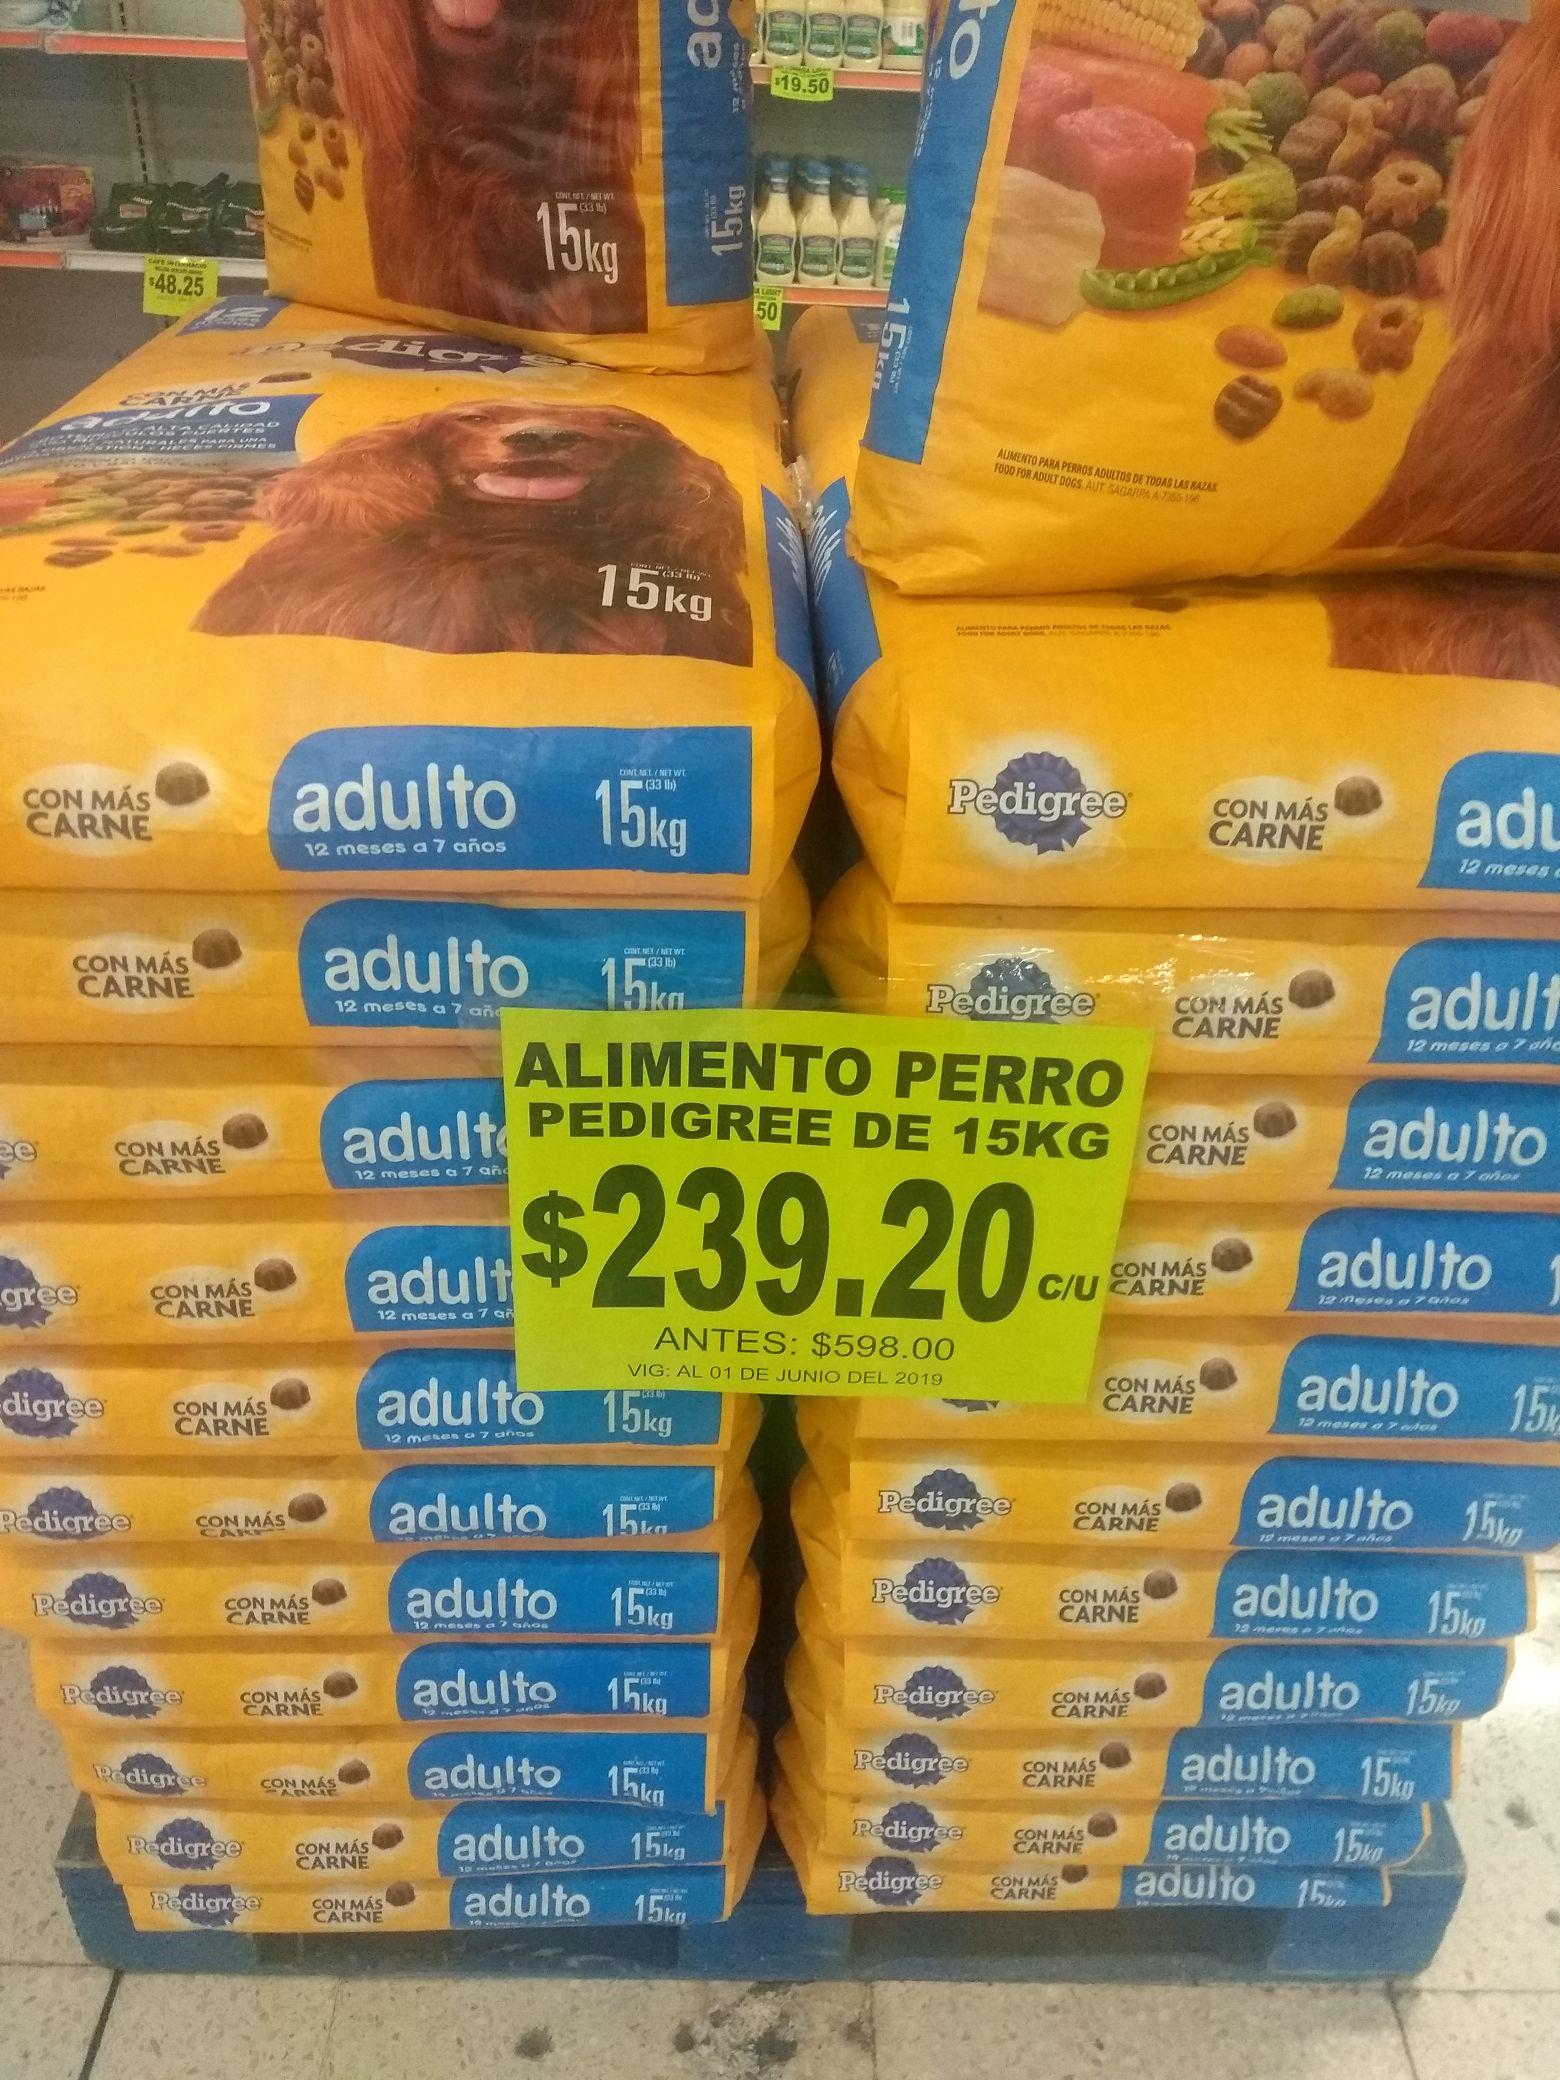 Mega Soriana: Pedigree 15kg en $239